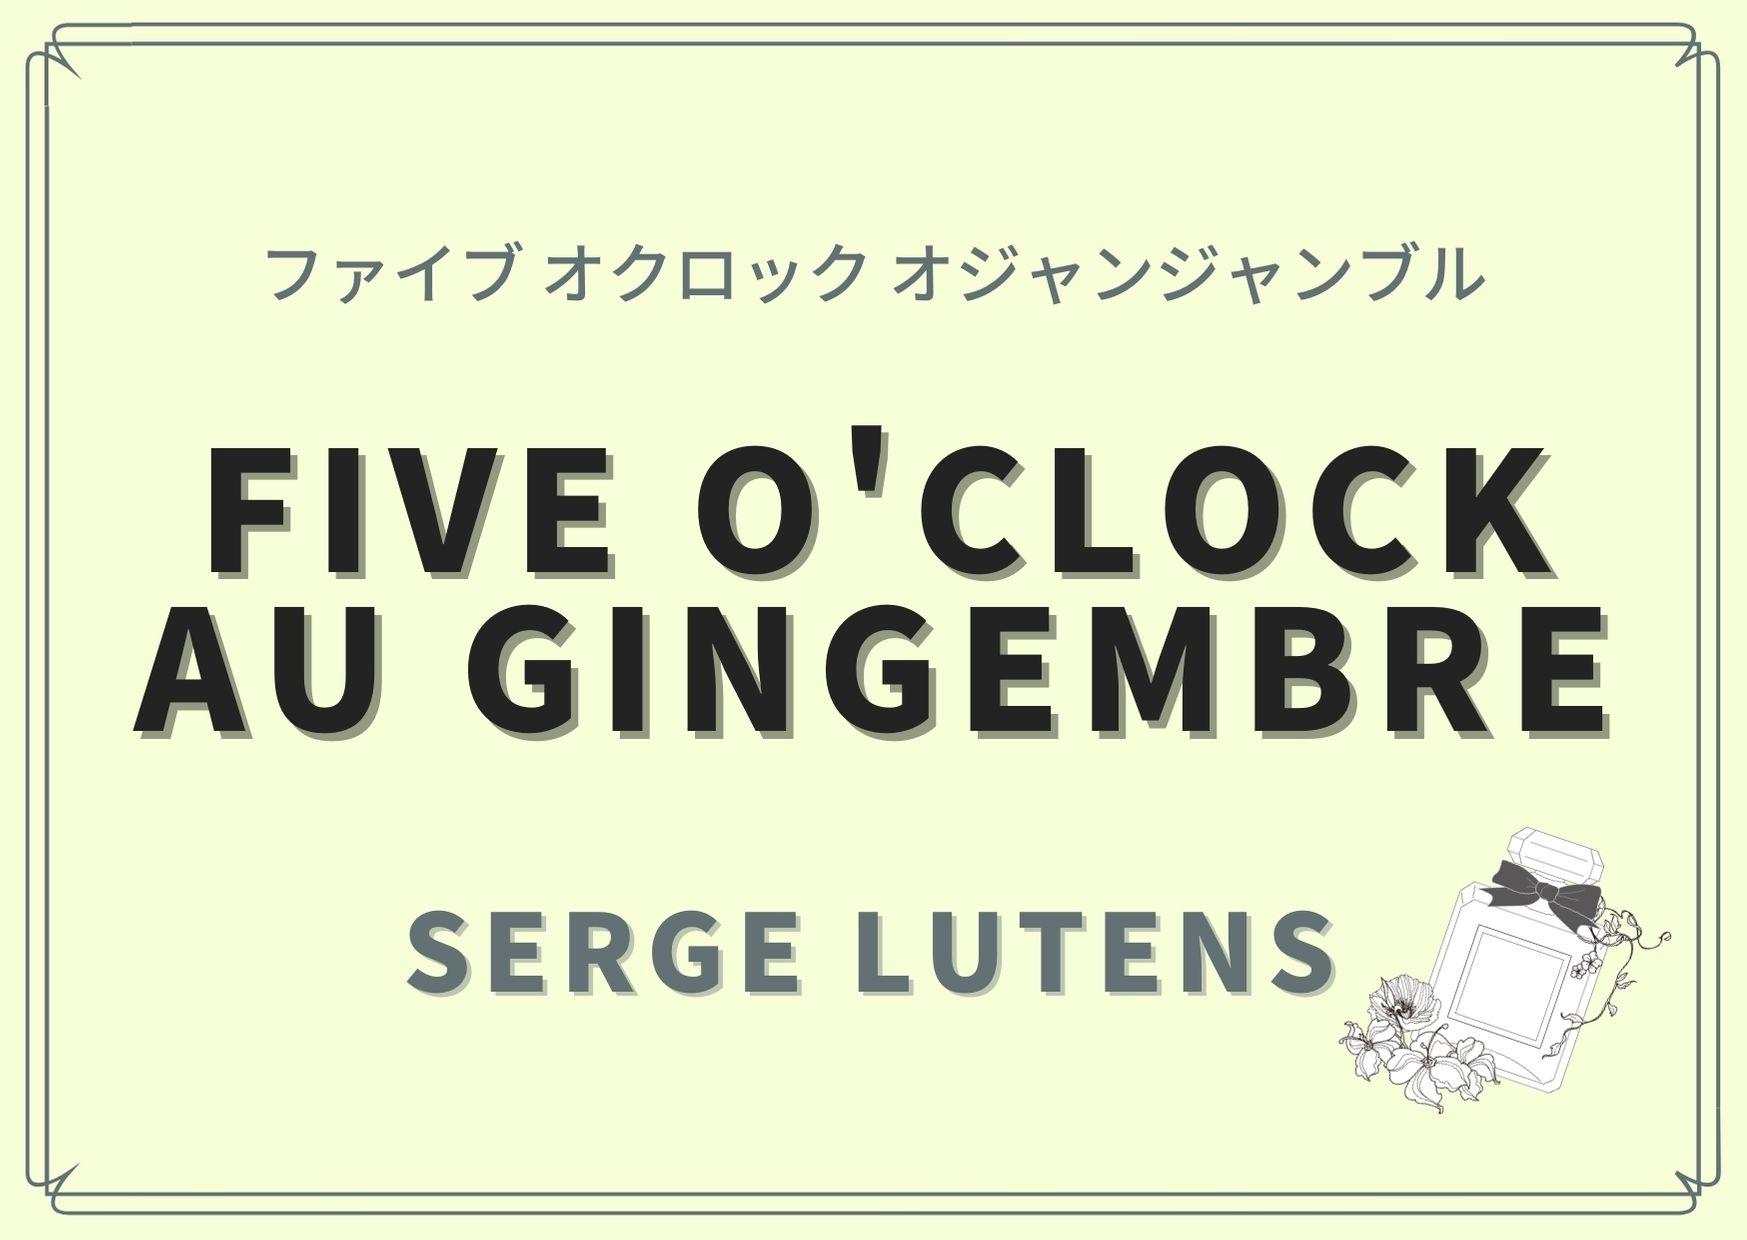 Five o'clock au gingembre(ファイブ オクロック オジャンジャンブル)/SERGE LUTENS(セルジュ ルタンス)